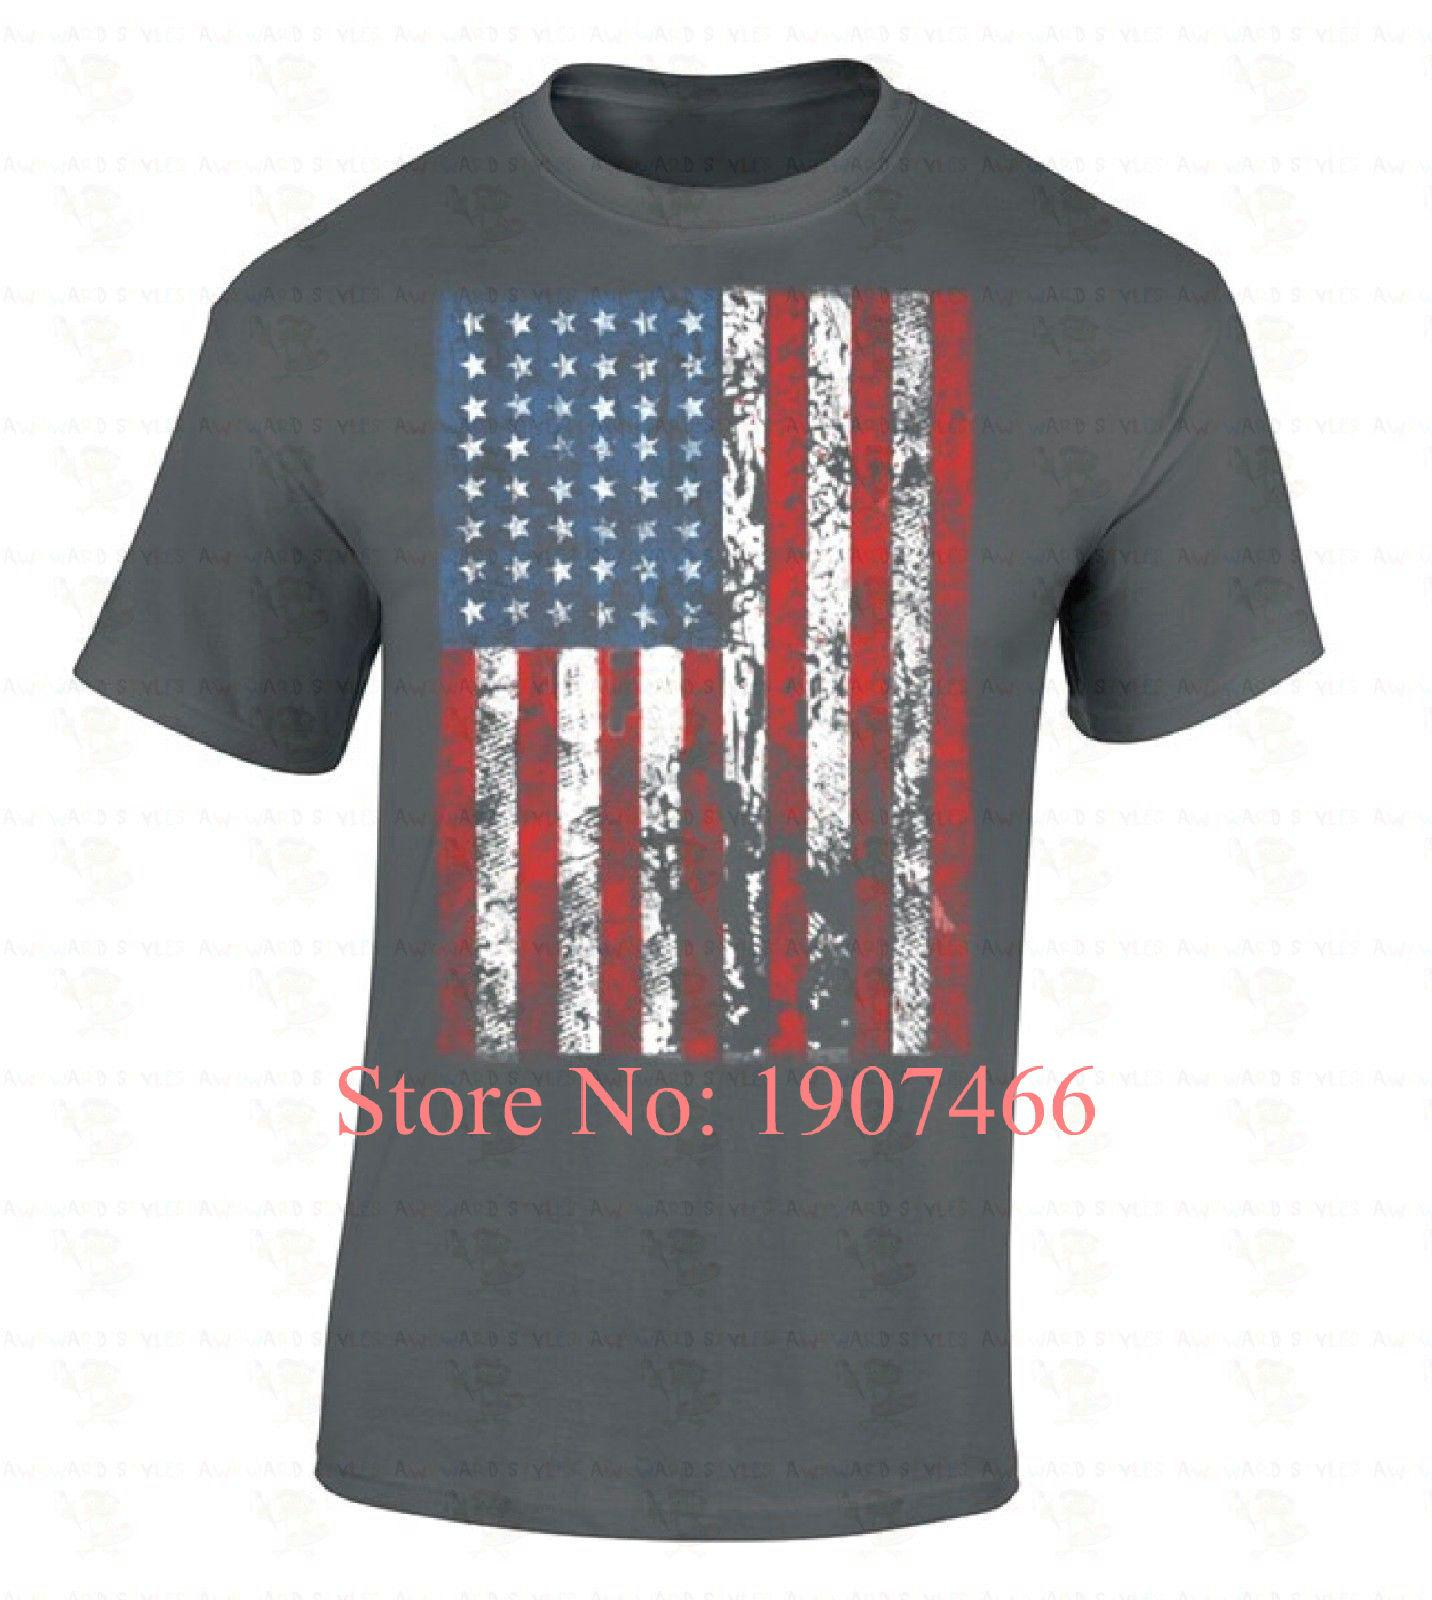 79c11ca416b American Flag T SHIRT Distressed Patriotic Tattered Vintage USA Flag Men'S  Tee Create Your Own T Shirt Design White T Shirt Design From Beidhgate03,  ...